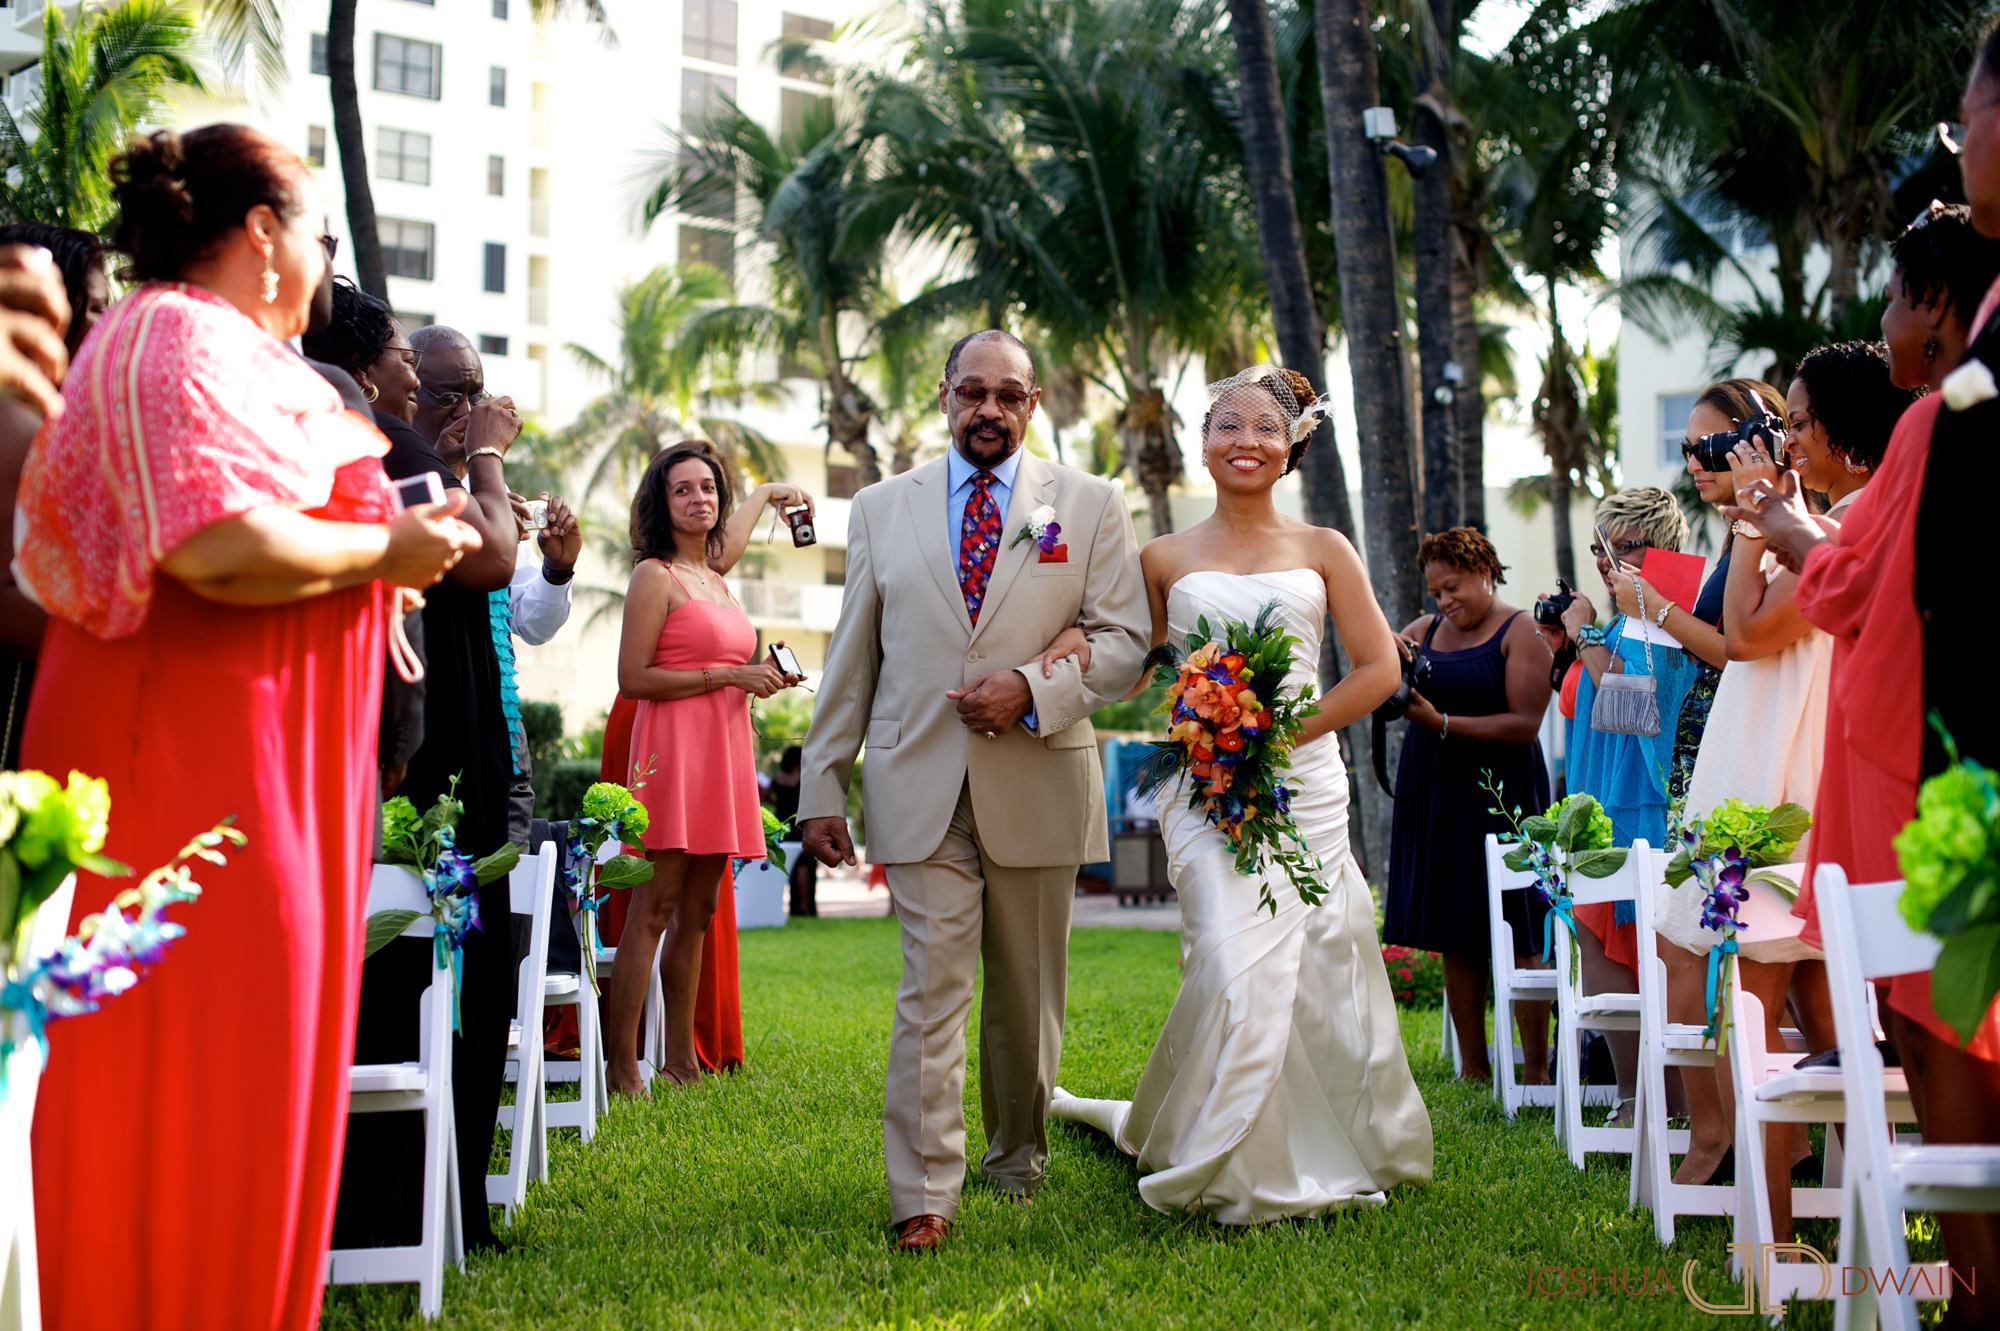 candra-alonza-006-holiday-inn-south-beach-miami-wedding-photographer-joshua-dwain-2012-07-28_ca_138